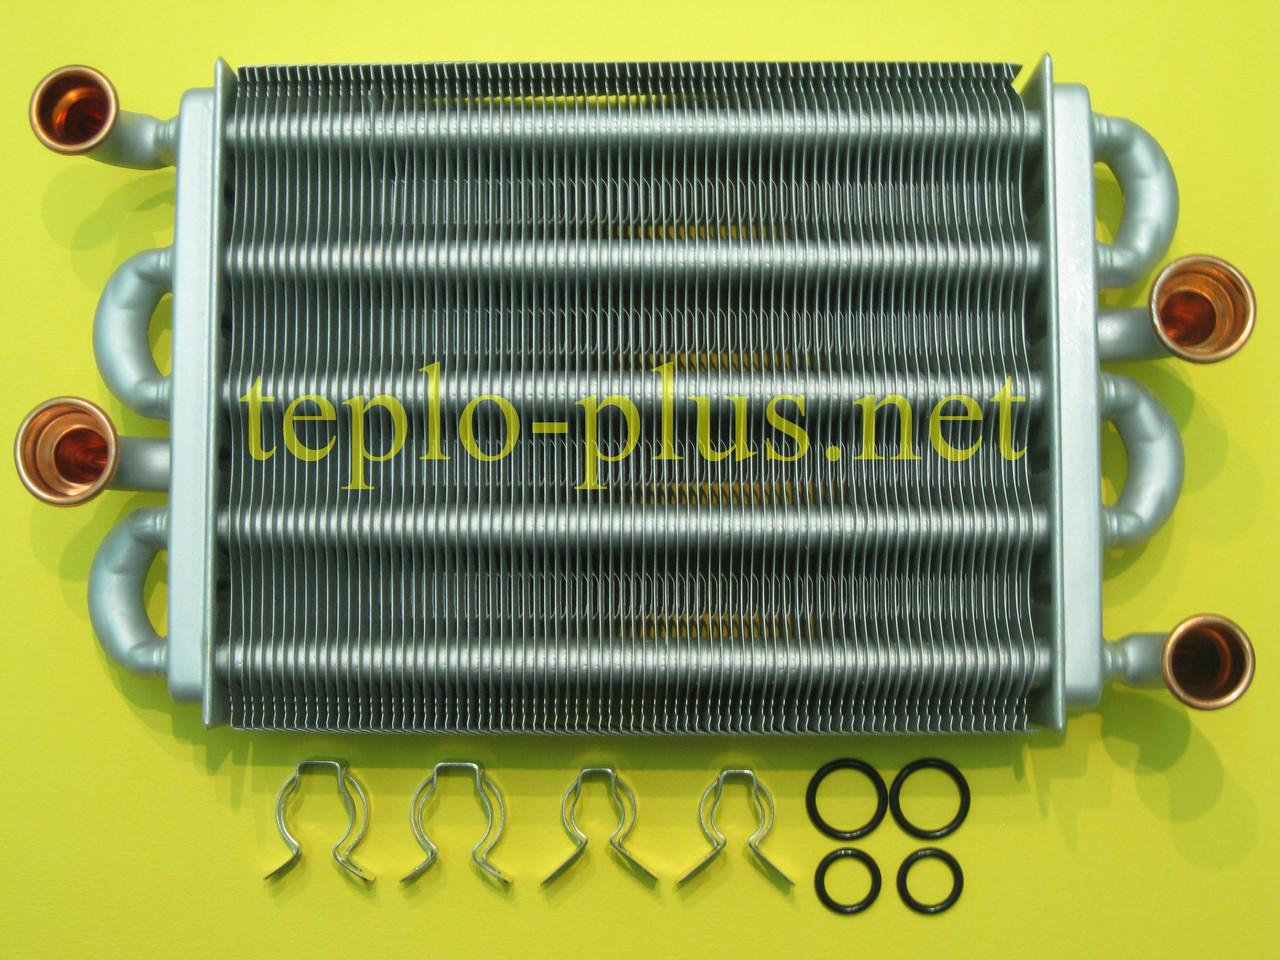 Теплообменник для ferroli domiproject f24 по украине цена на теплообменник для газового котла